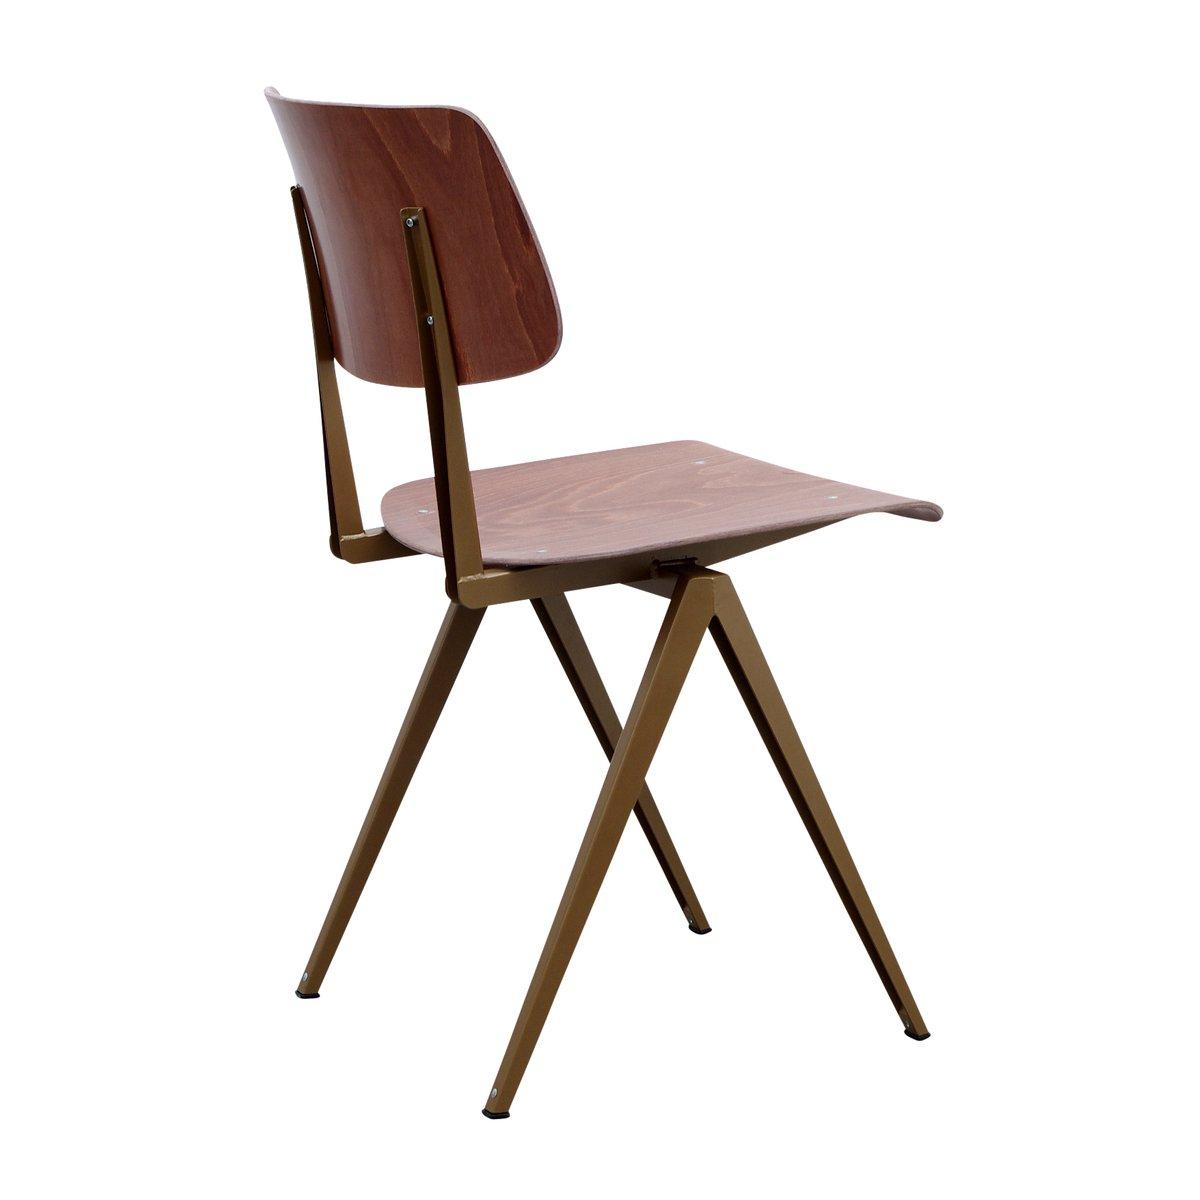 Niederl ndischer modell s16 stuhl aus goldperle brauner for Brauner stuhl